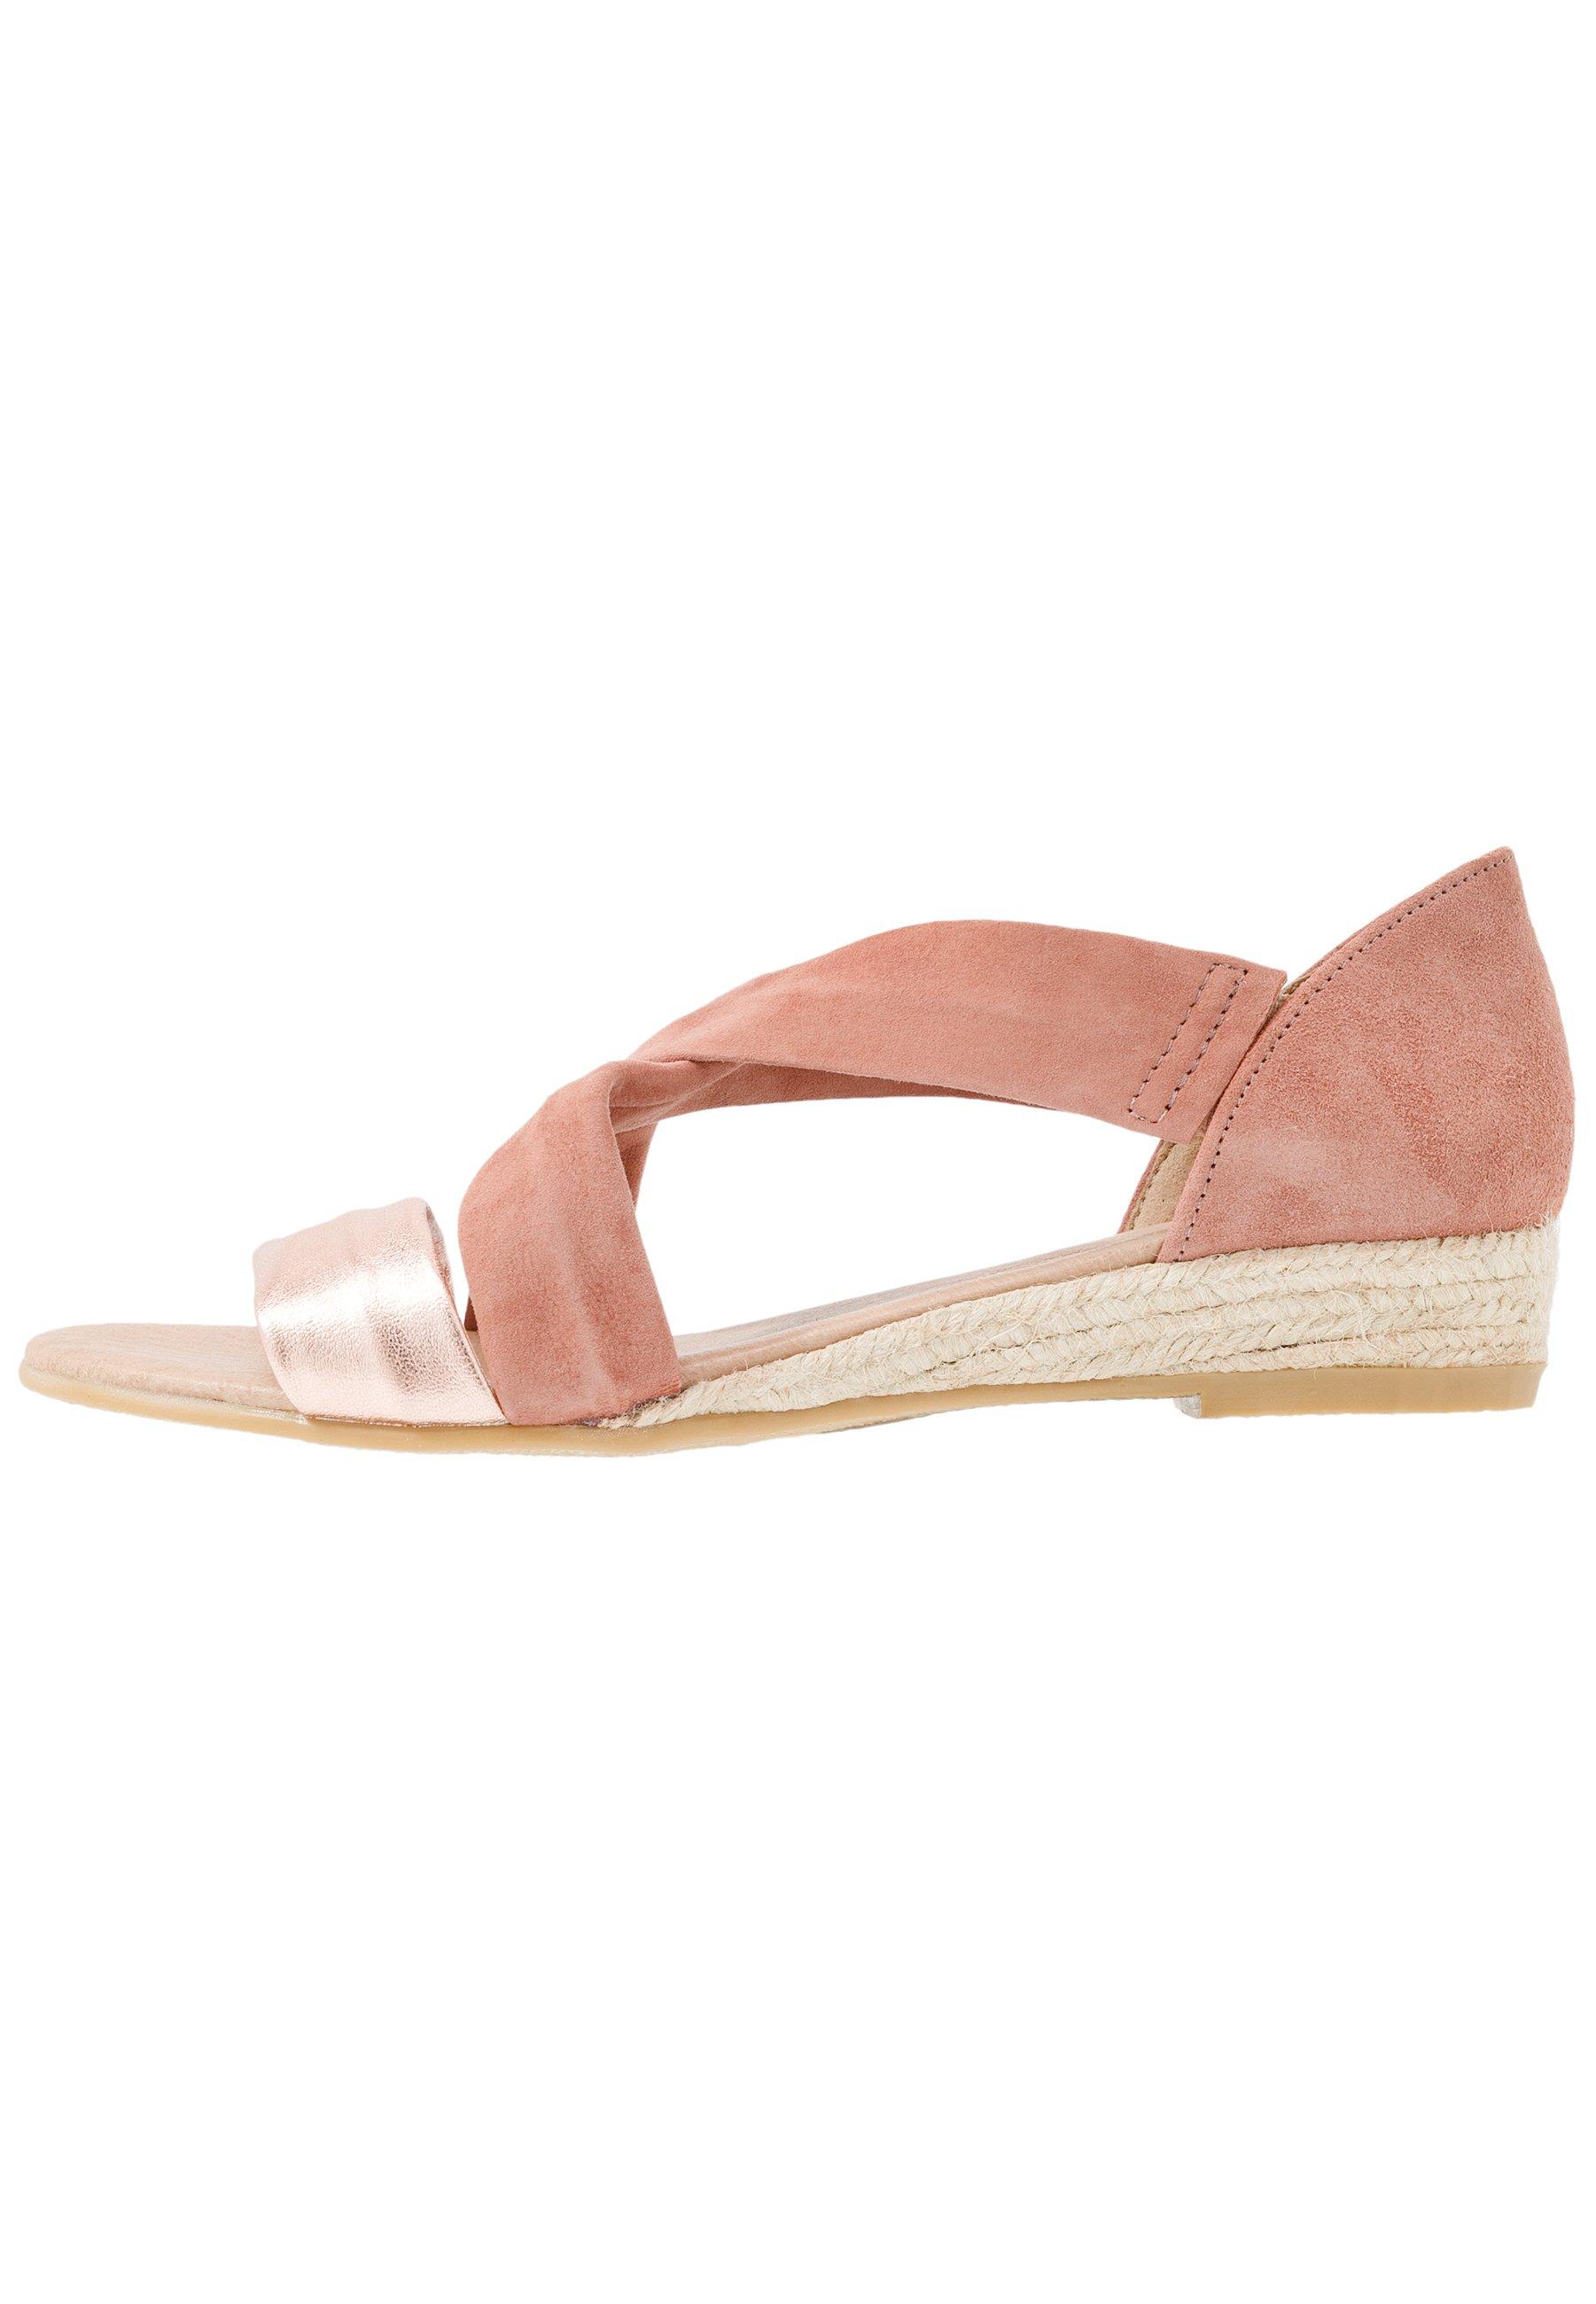 Office Hallie - Sandaletter Med Kilklack Gold